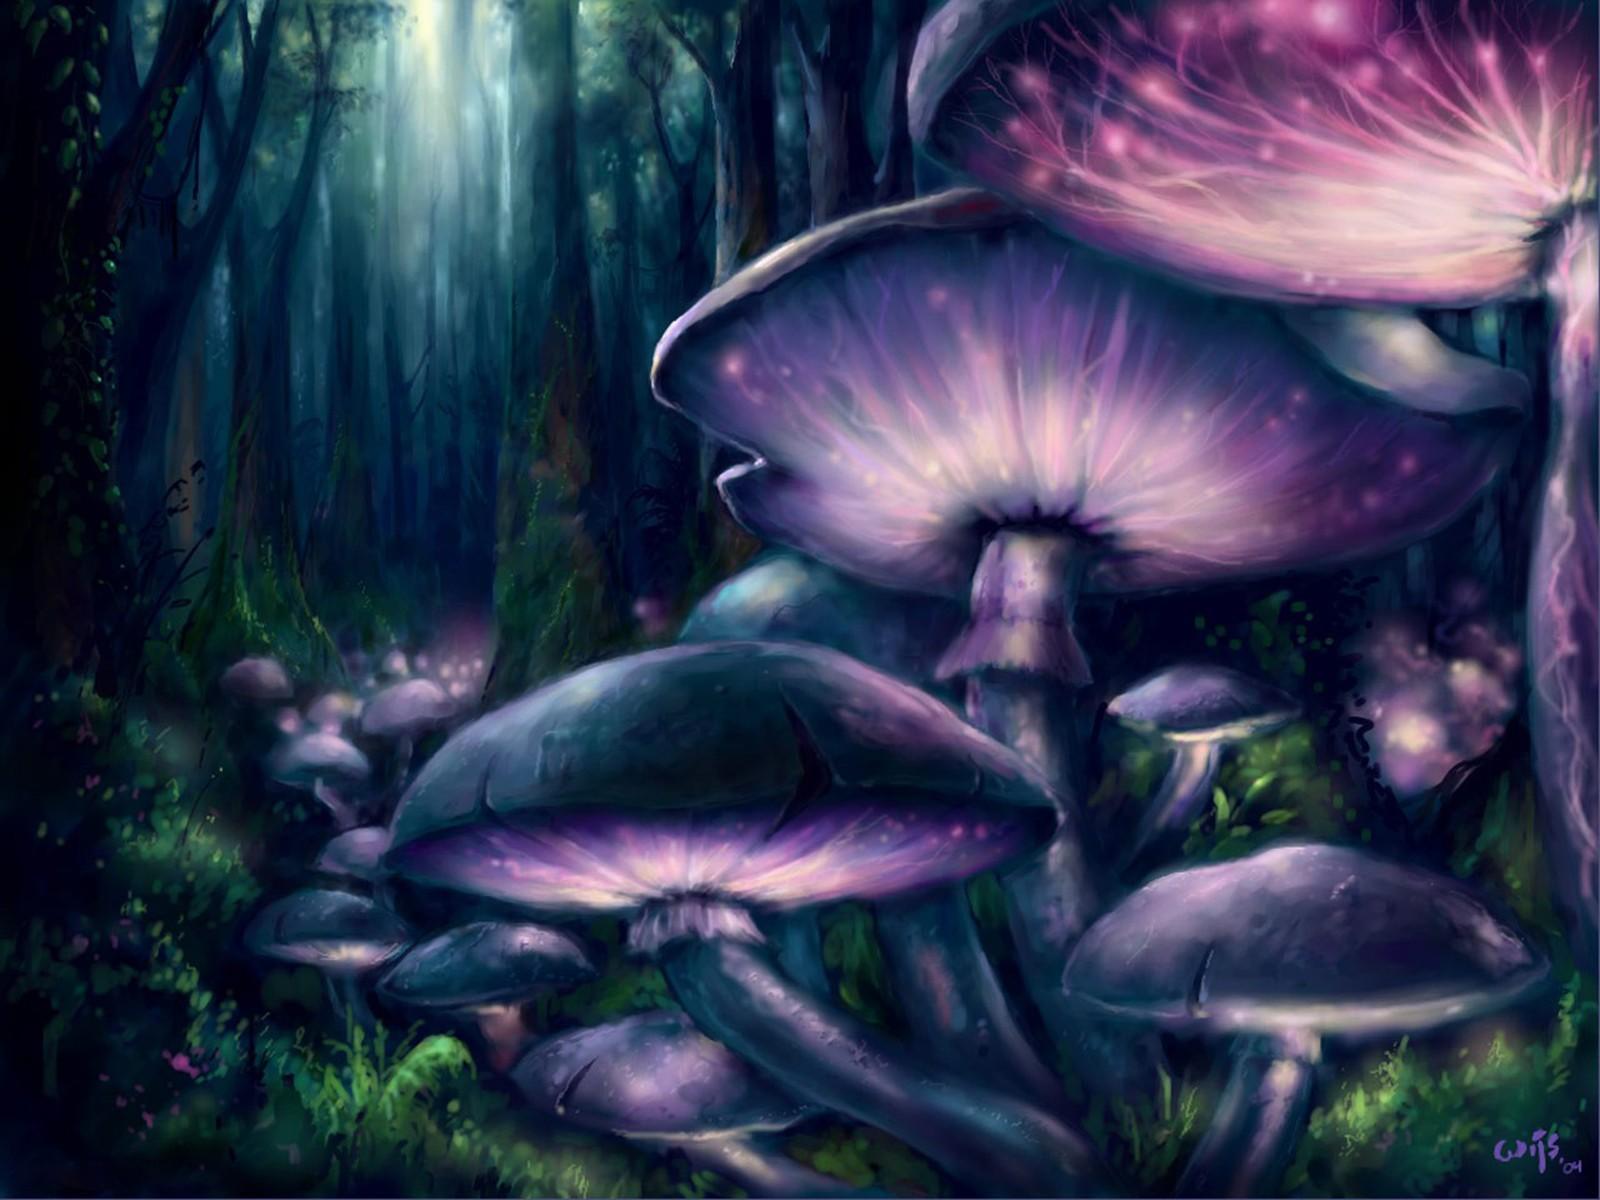 enchanted mushroom wallpaper - photo #22